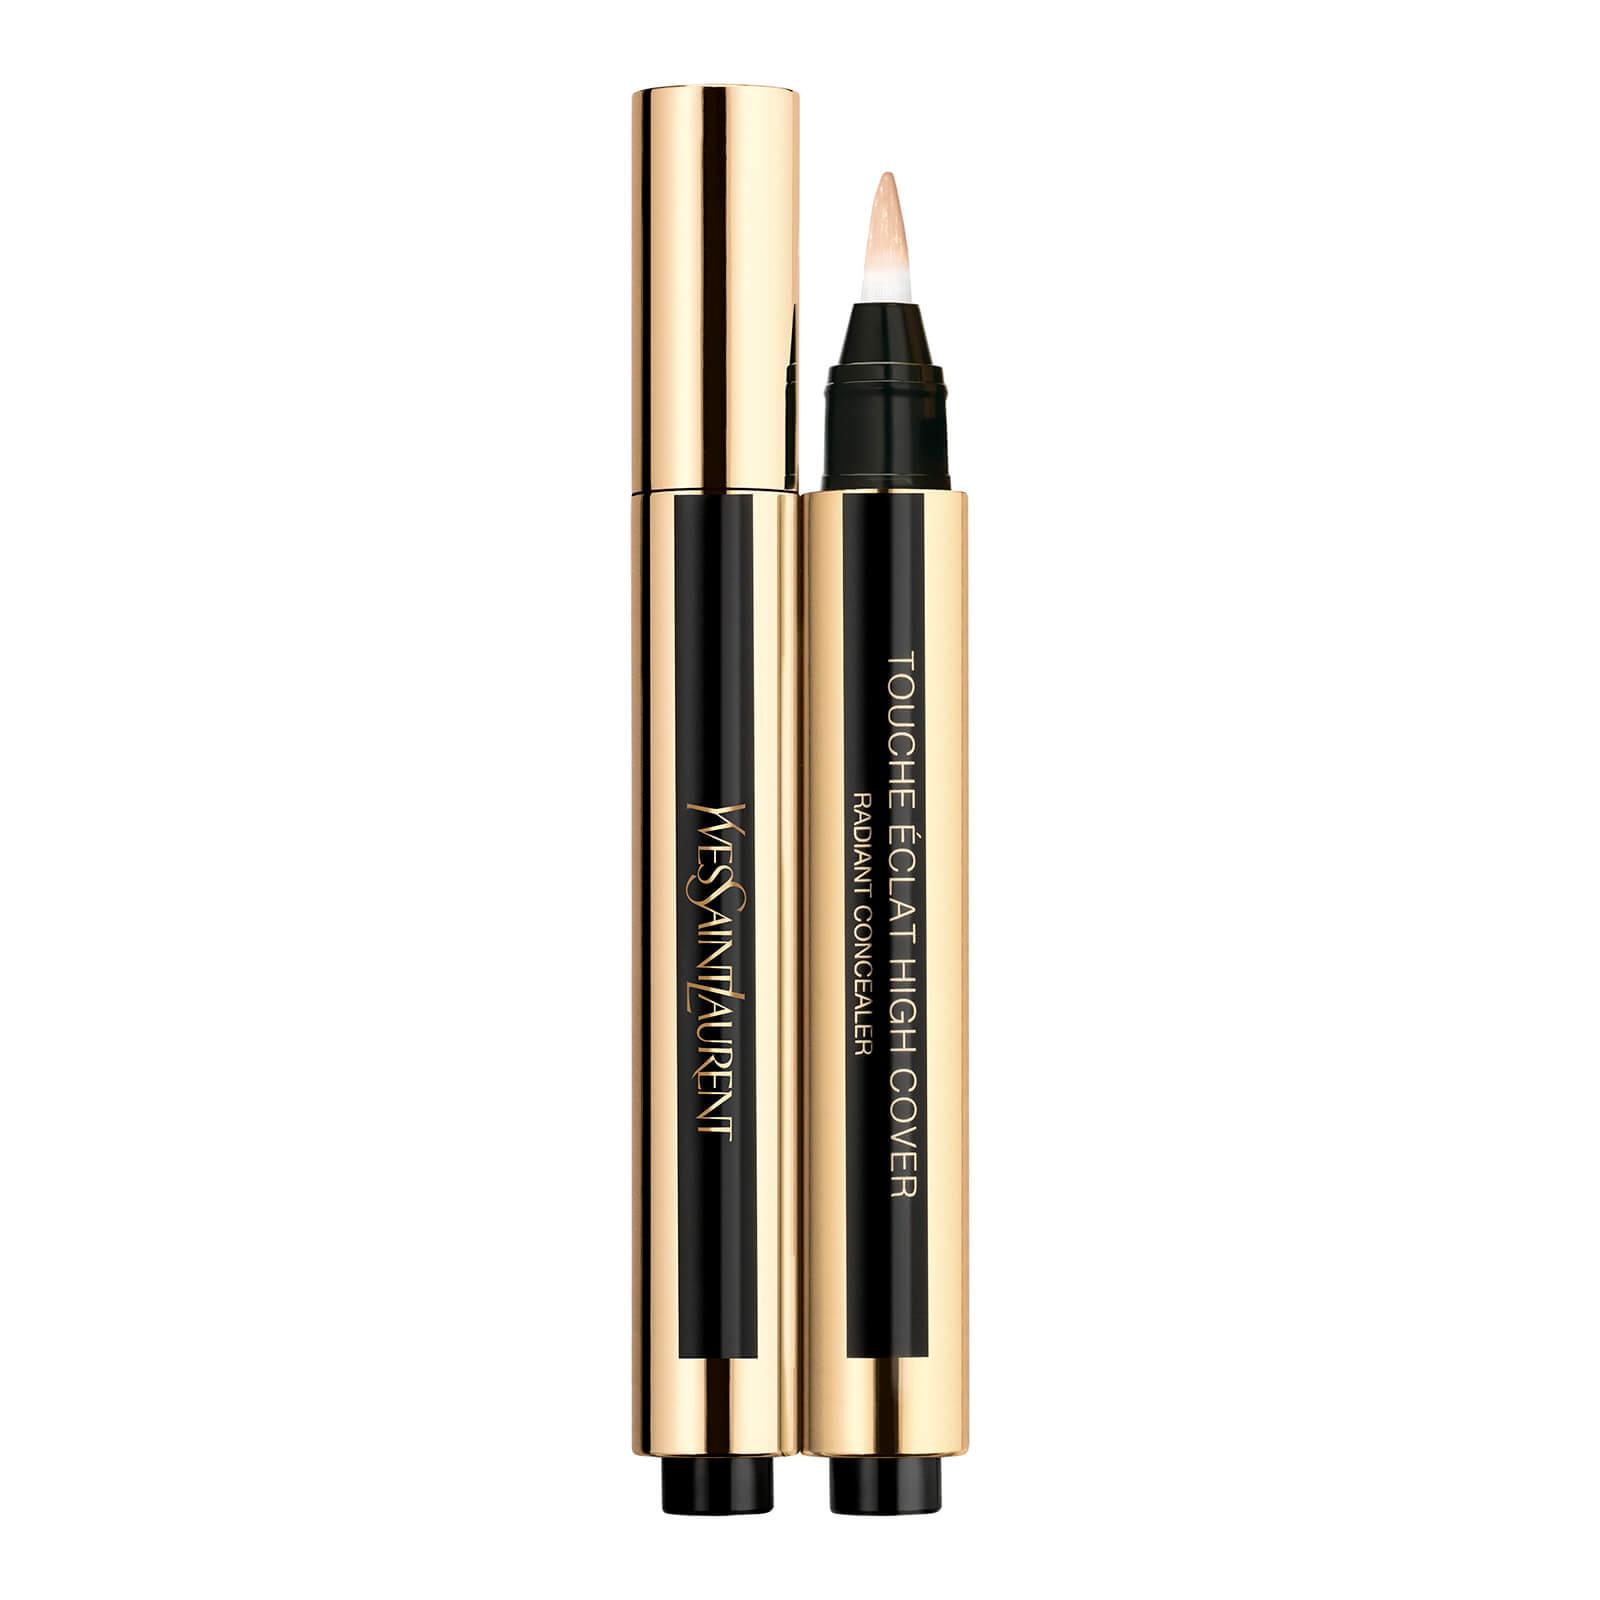 Yves Saint Laurent Touche Éclat High Cover Concealer 2.5ml (Various Shades) - 0.75 Sugar